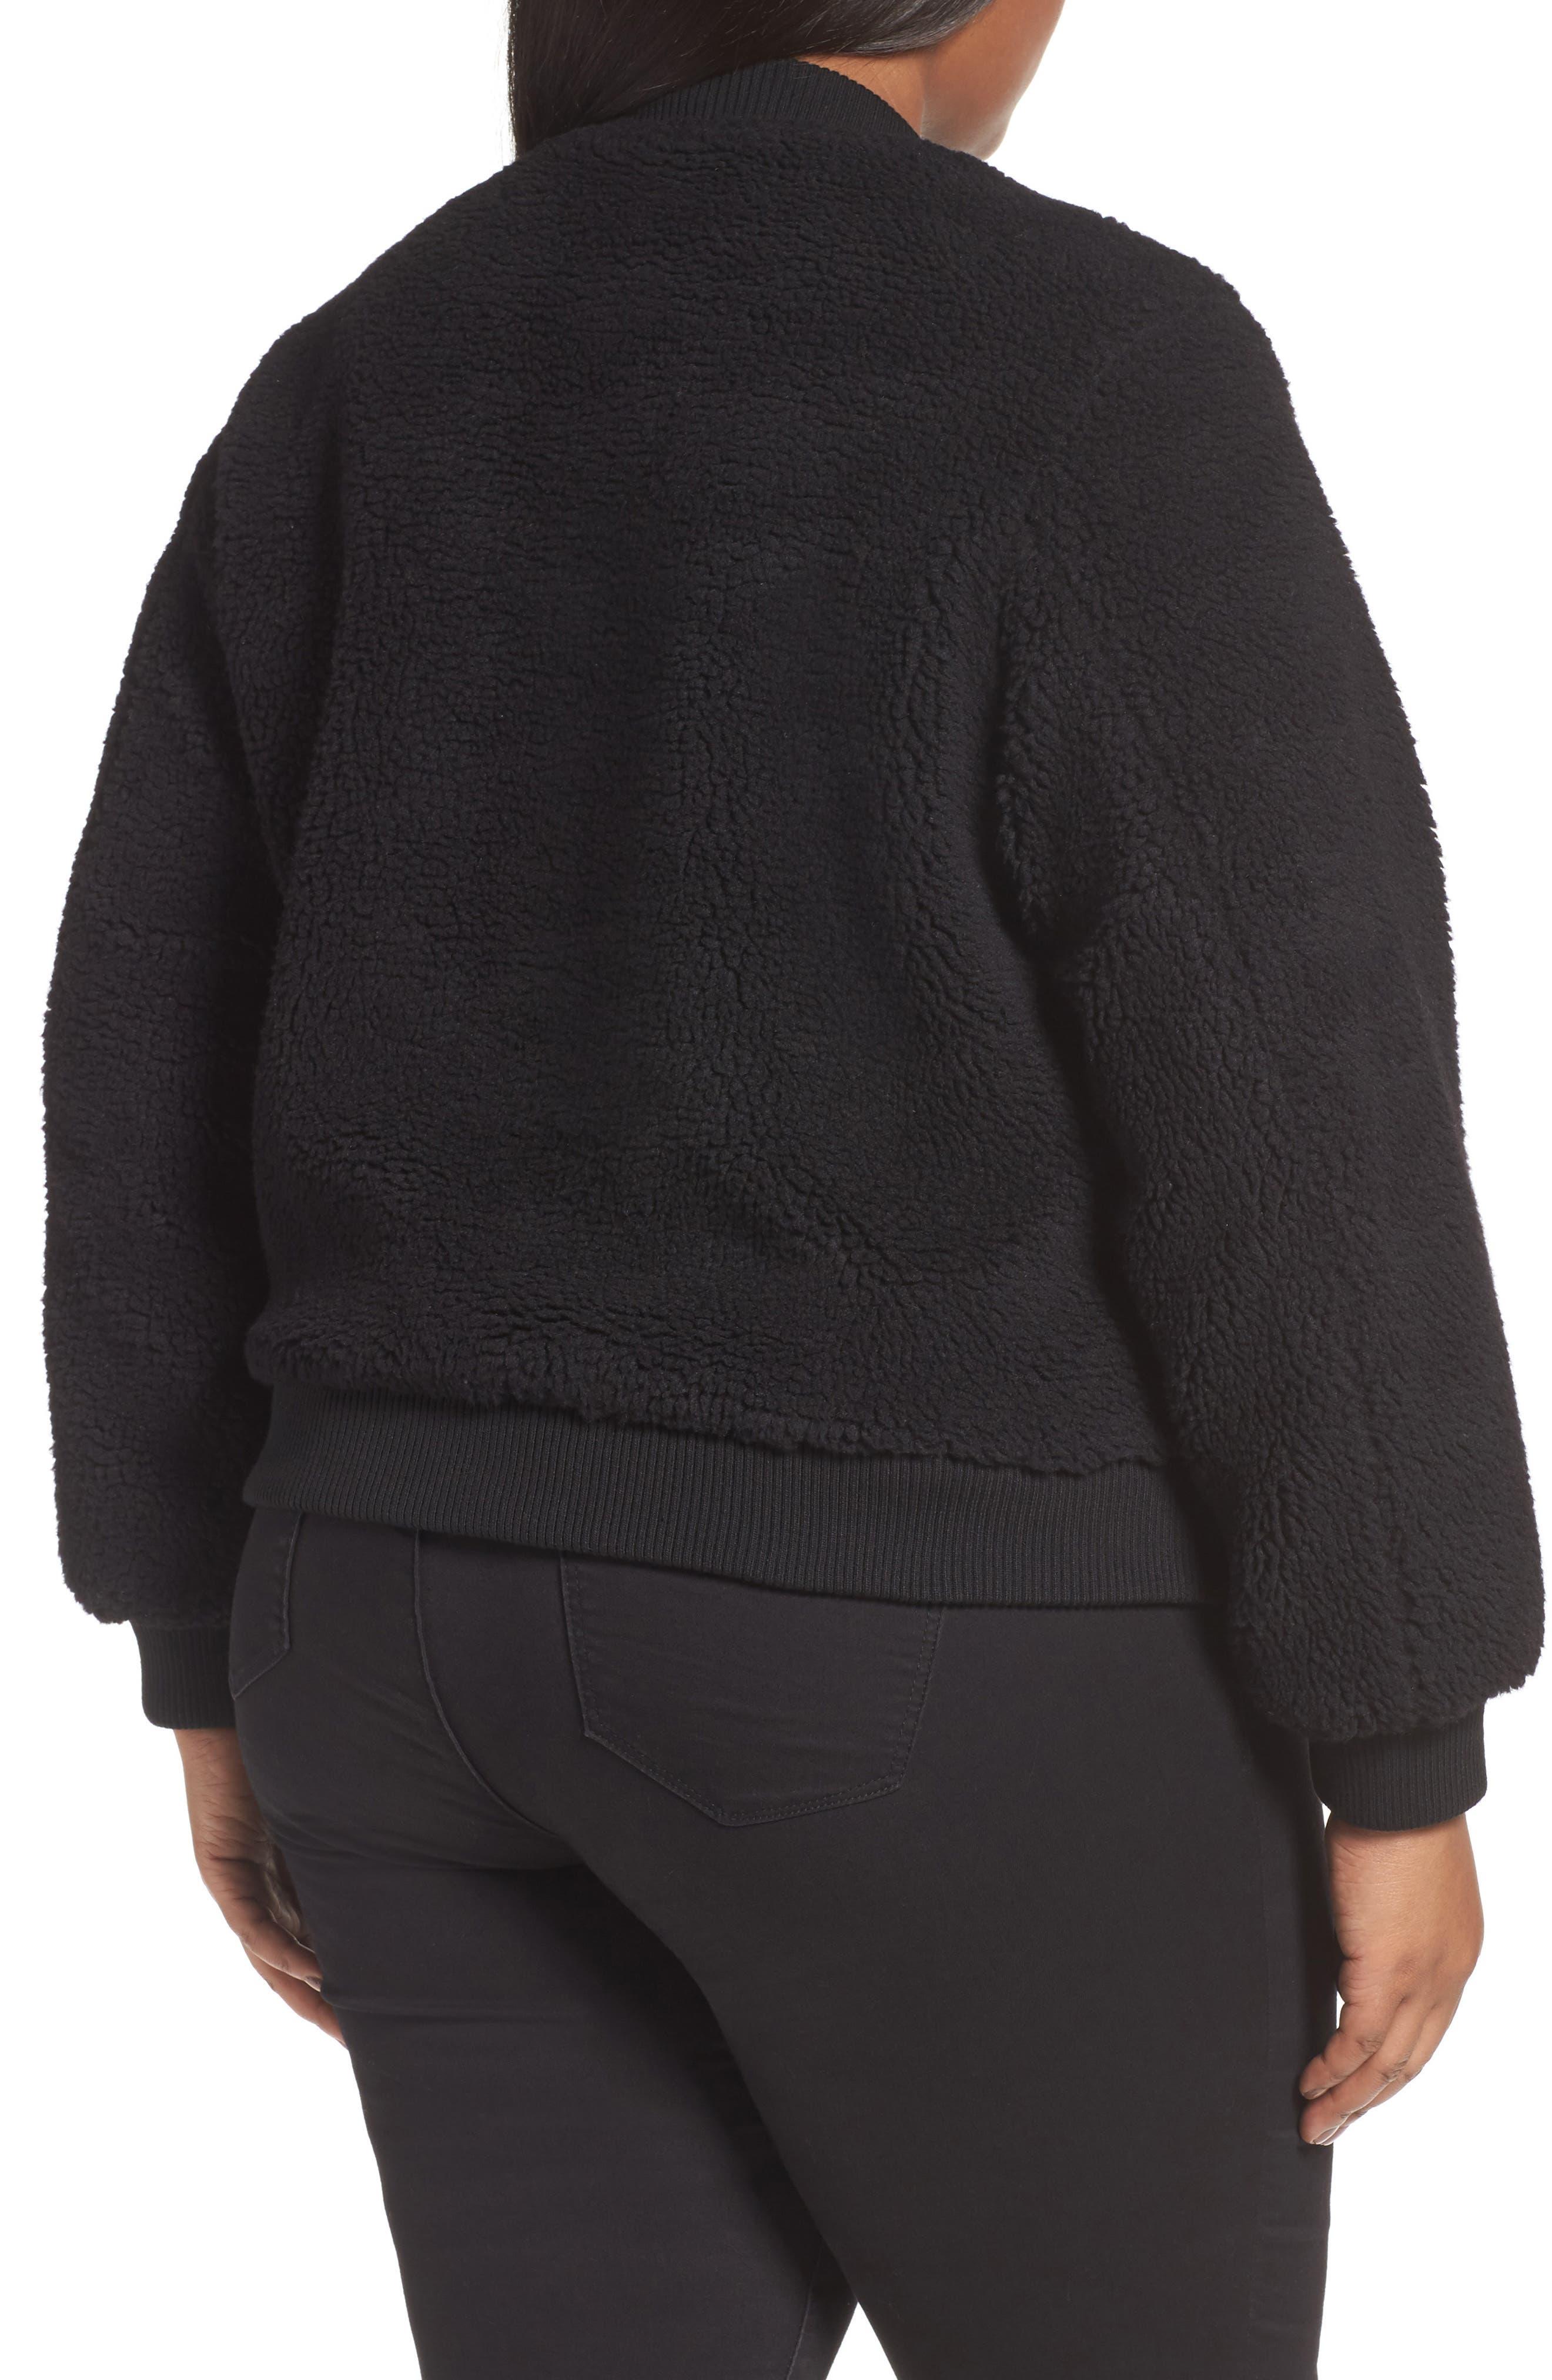 Rib Knit Fleece Bomber Jacket,                             Alternate thumbnail 2, color,                             Black